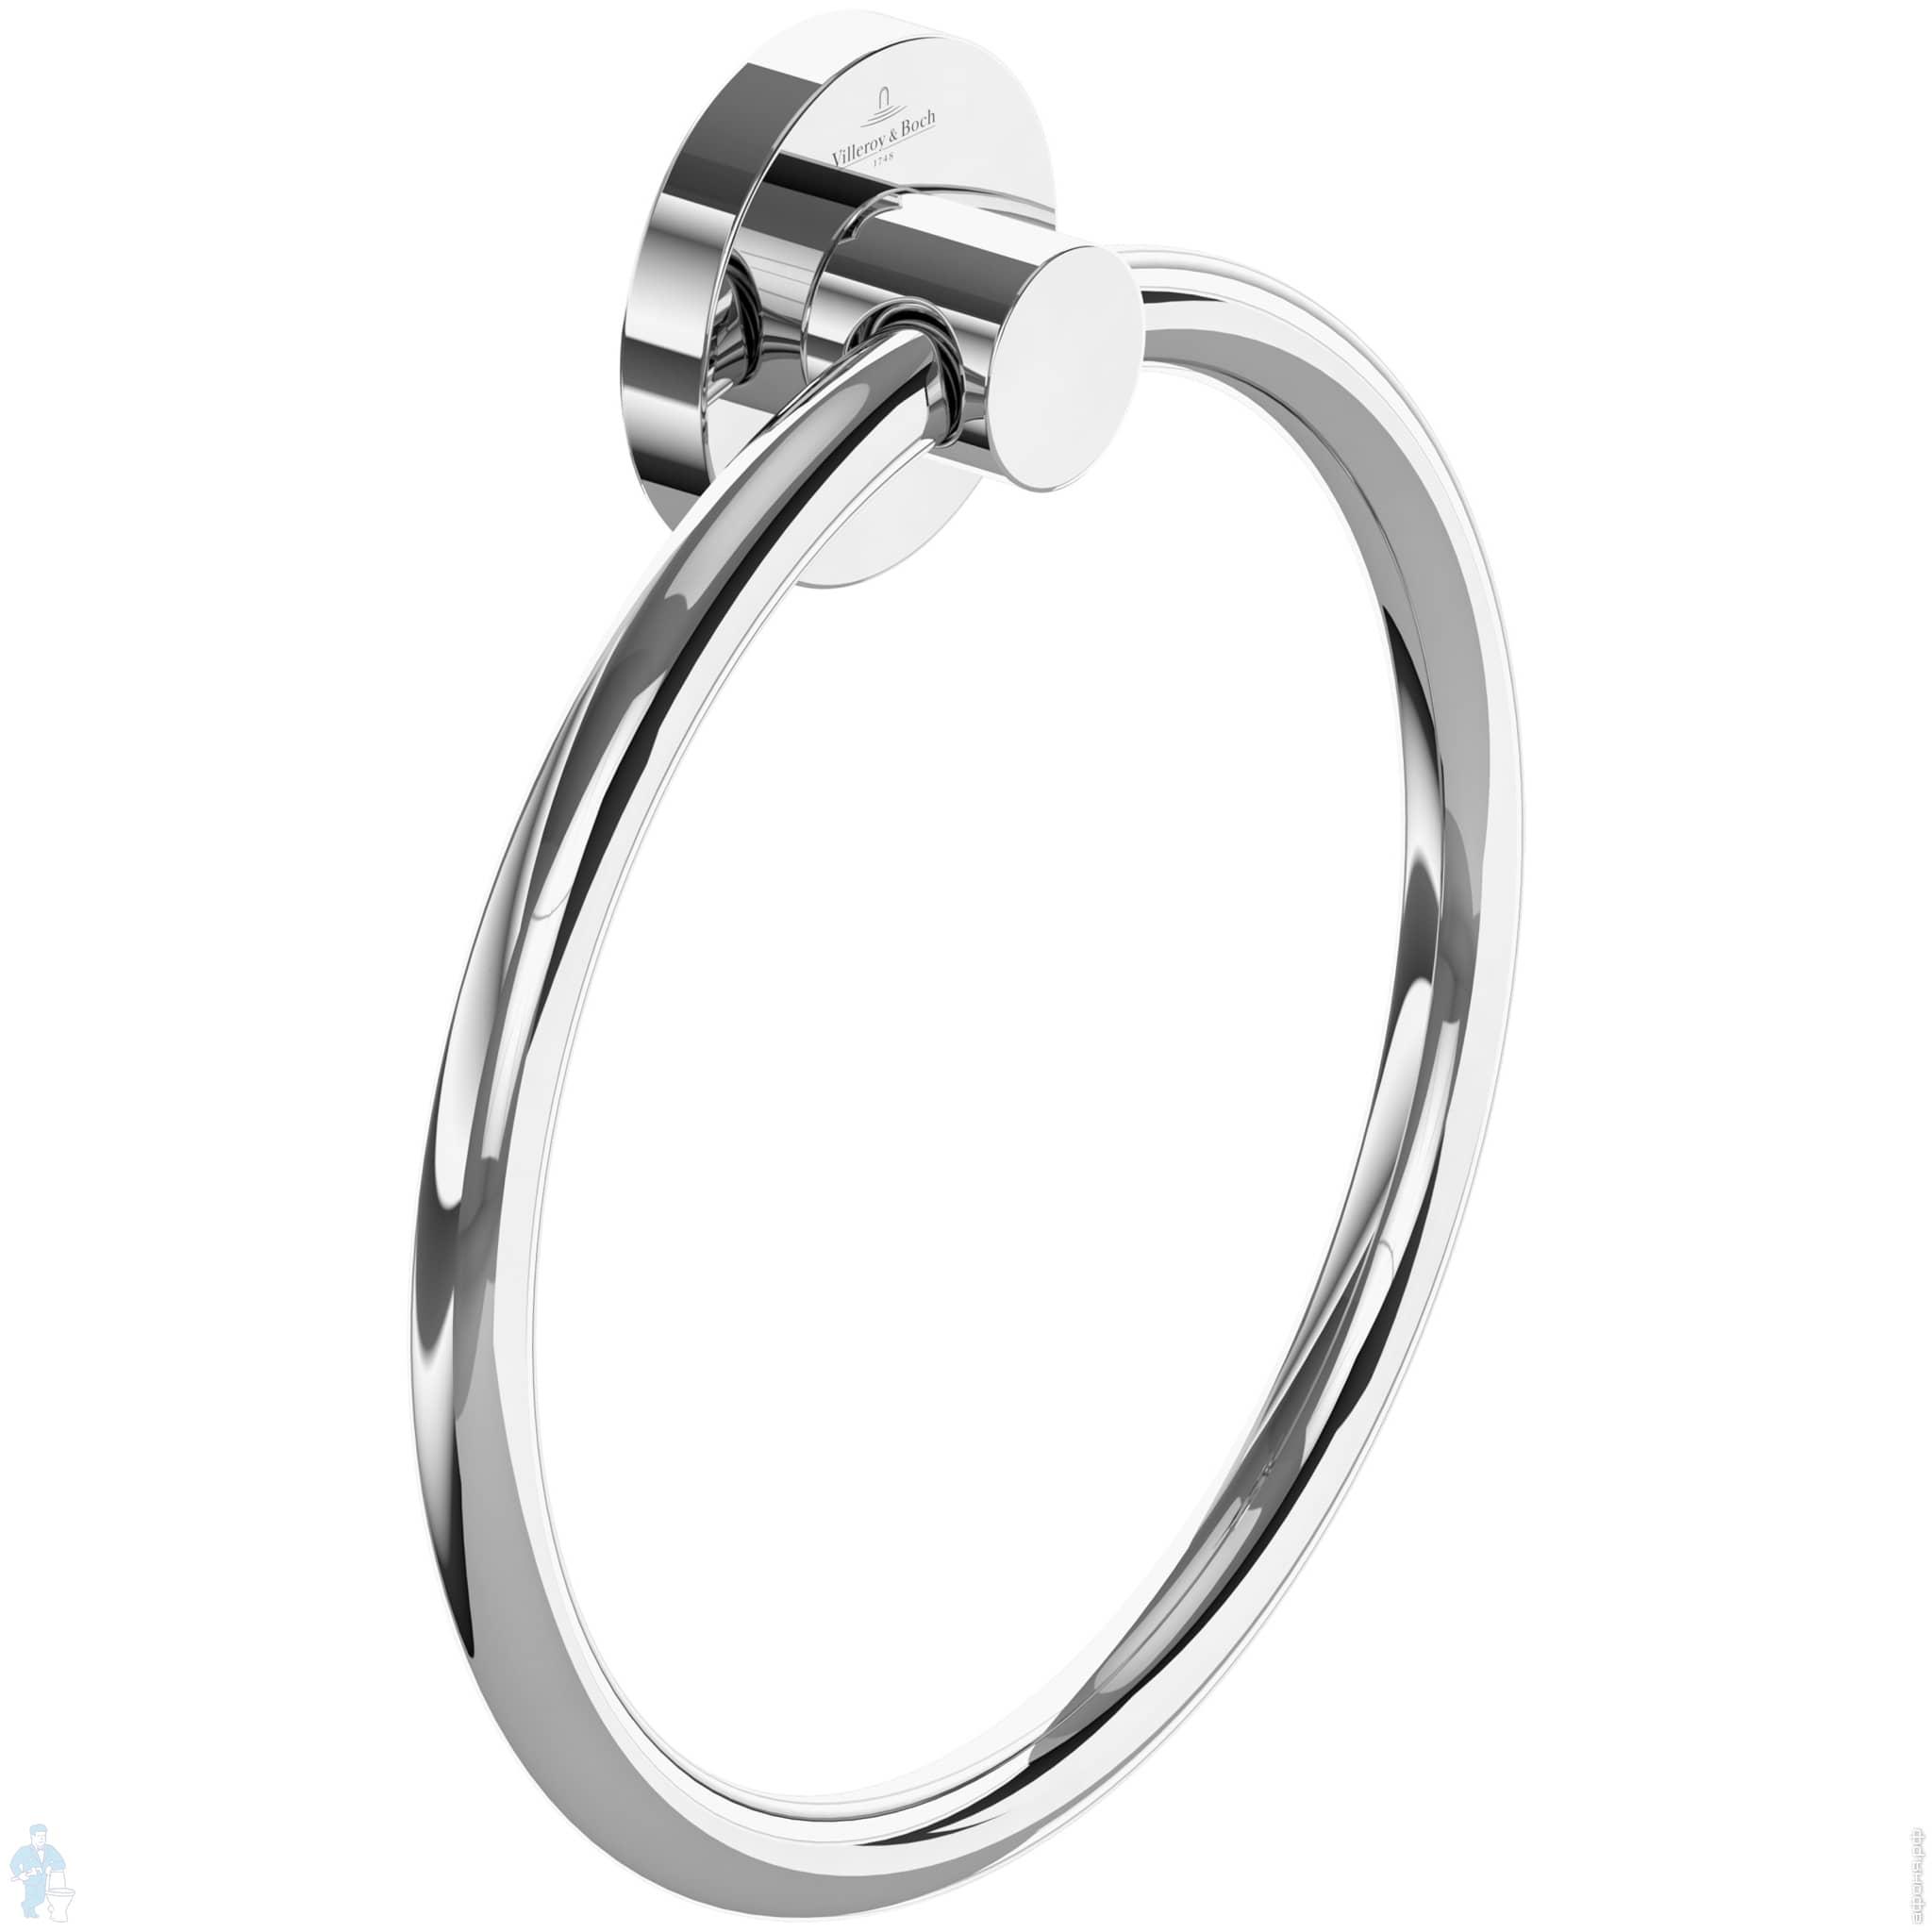 Полотенцедержатель-кольцо Villeroy & Boch ELEMENTS TENDER хром TVA15100500061 | Афоня.рф, цена 2 951 руб.